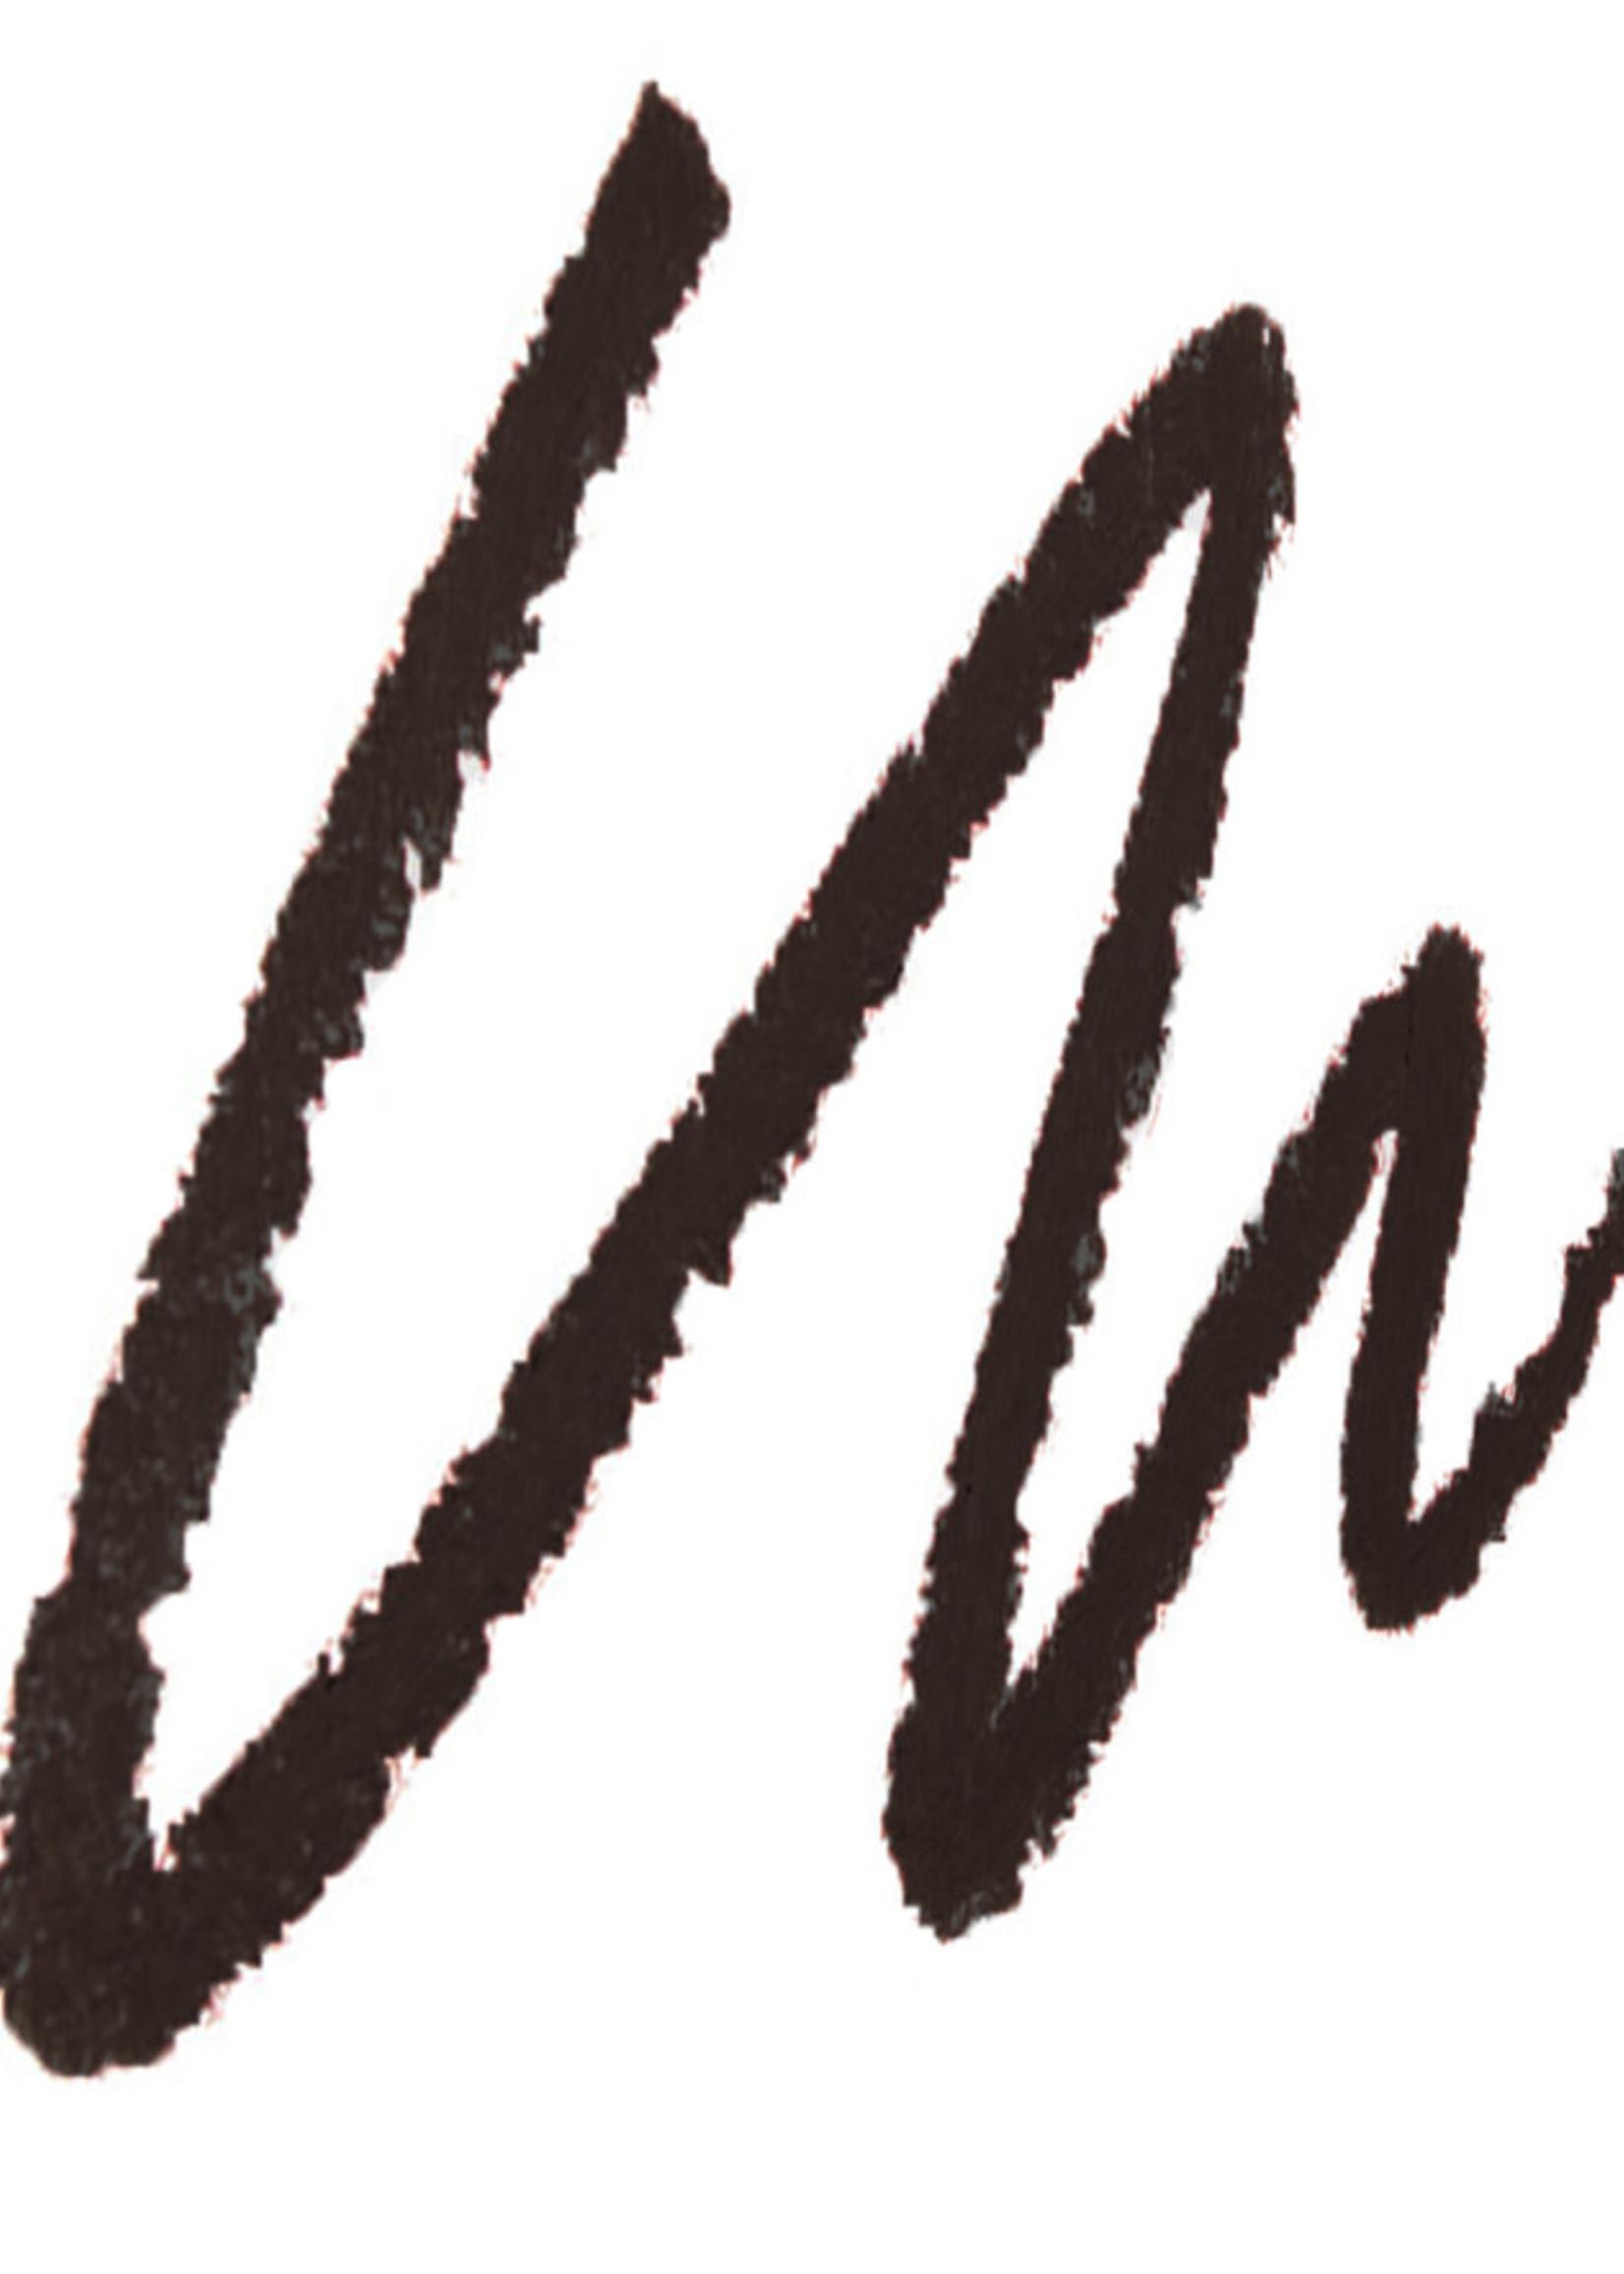 Elate EyeLine Pencil: Onyx